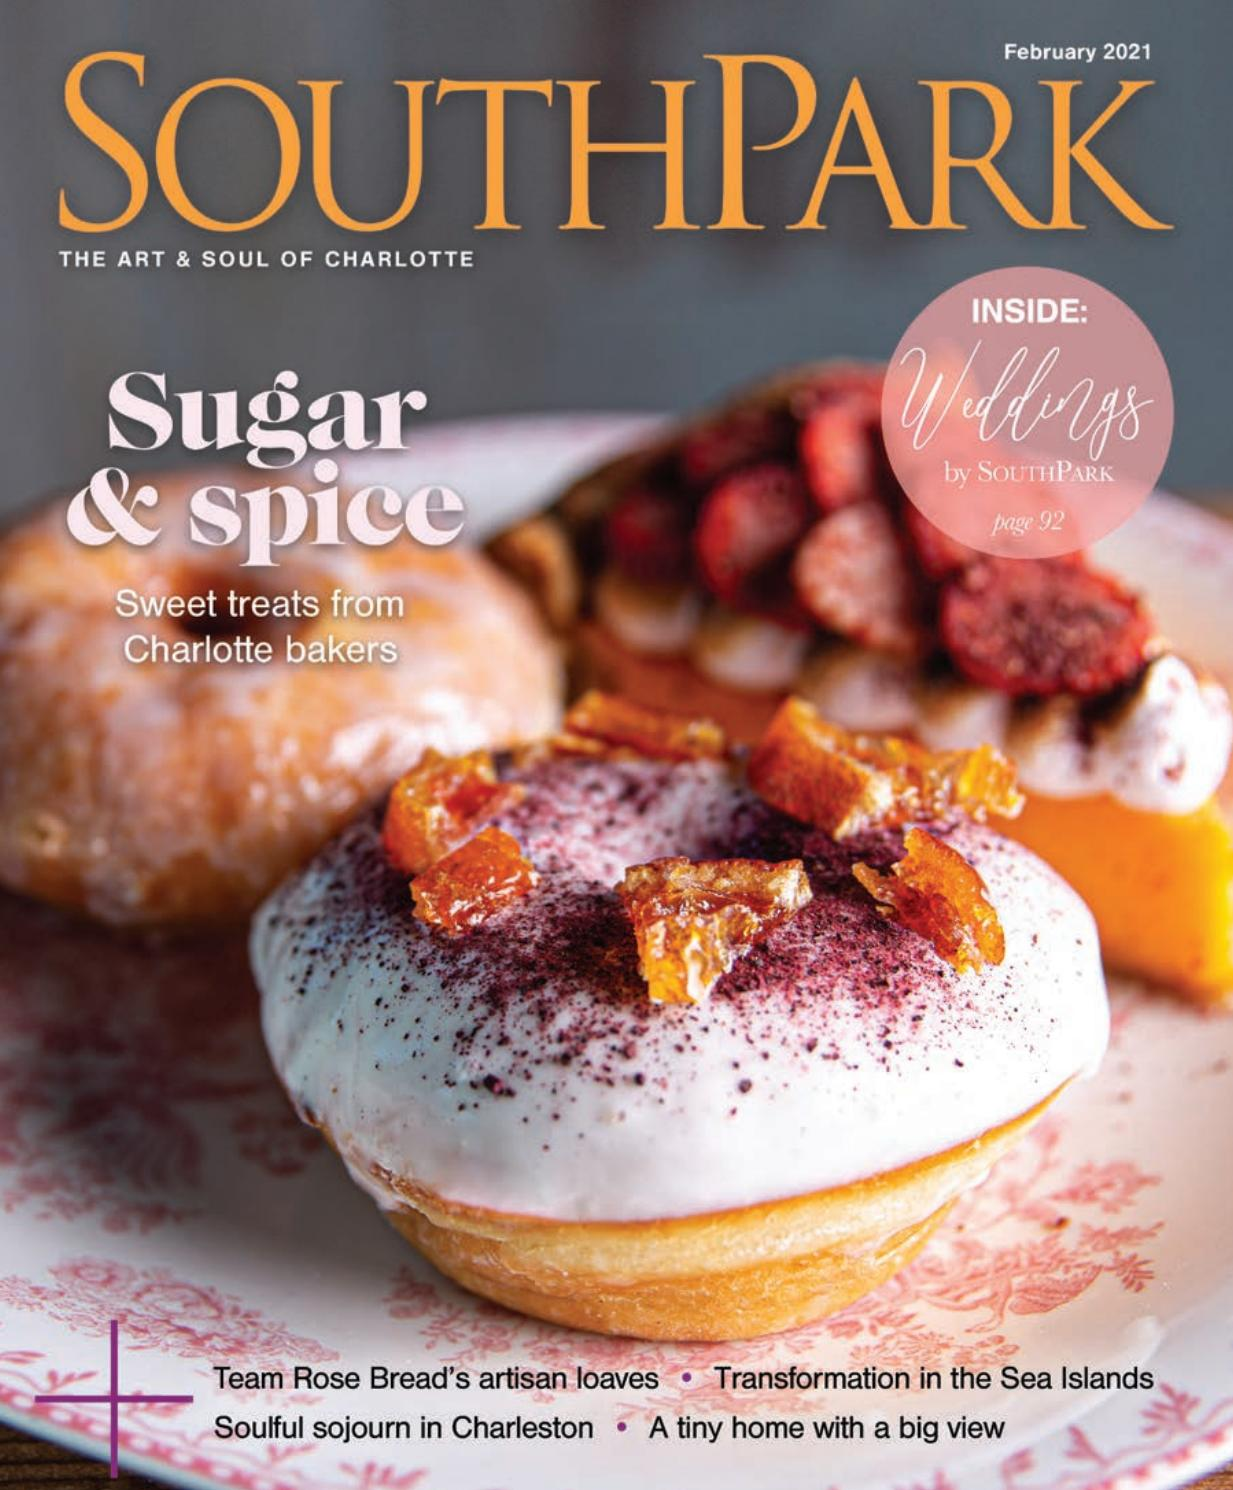 SouthPark February 18 by SouthParkMag   issuu